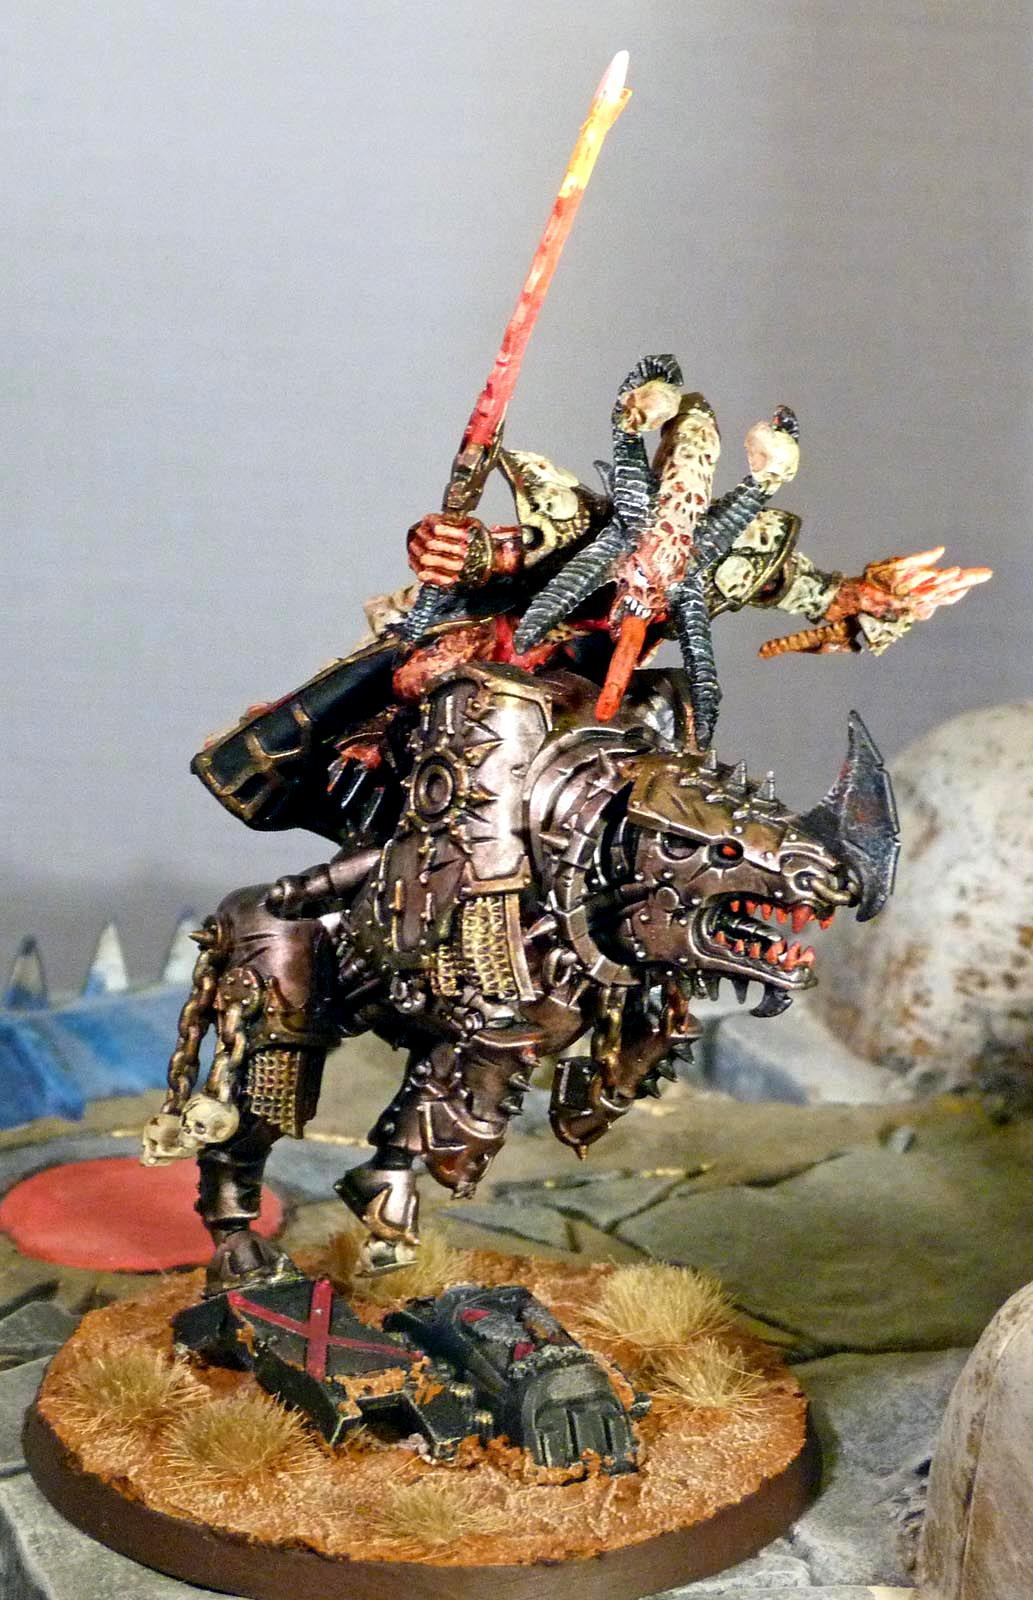 Daemons, Kirasu, Warhammer 40,000